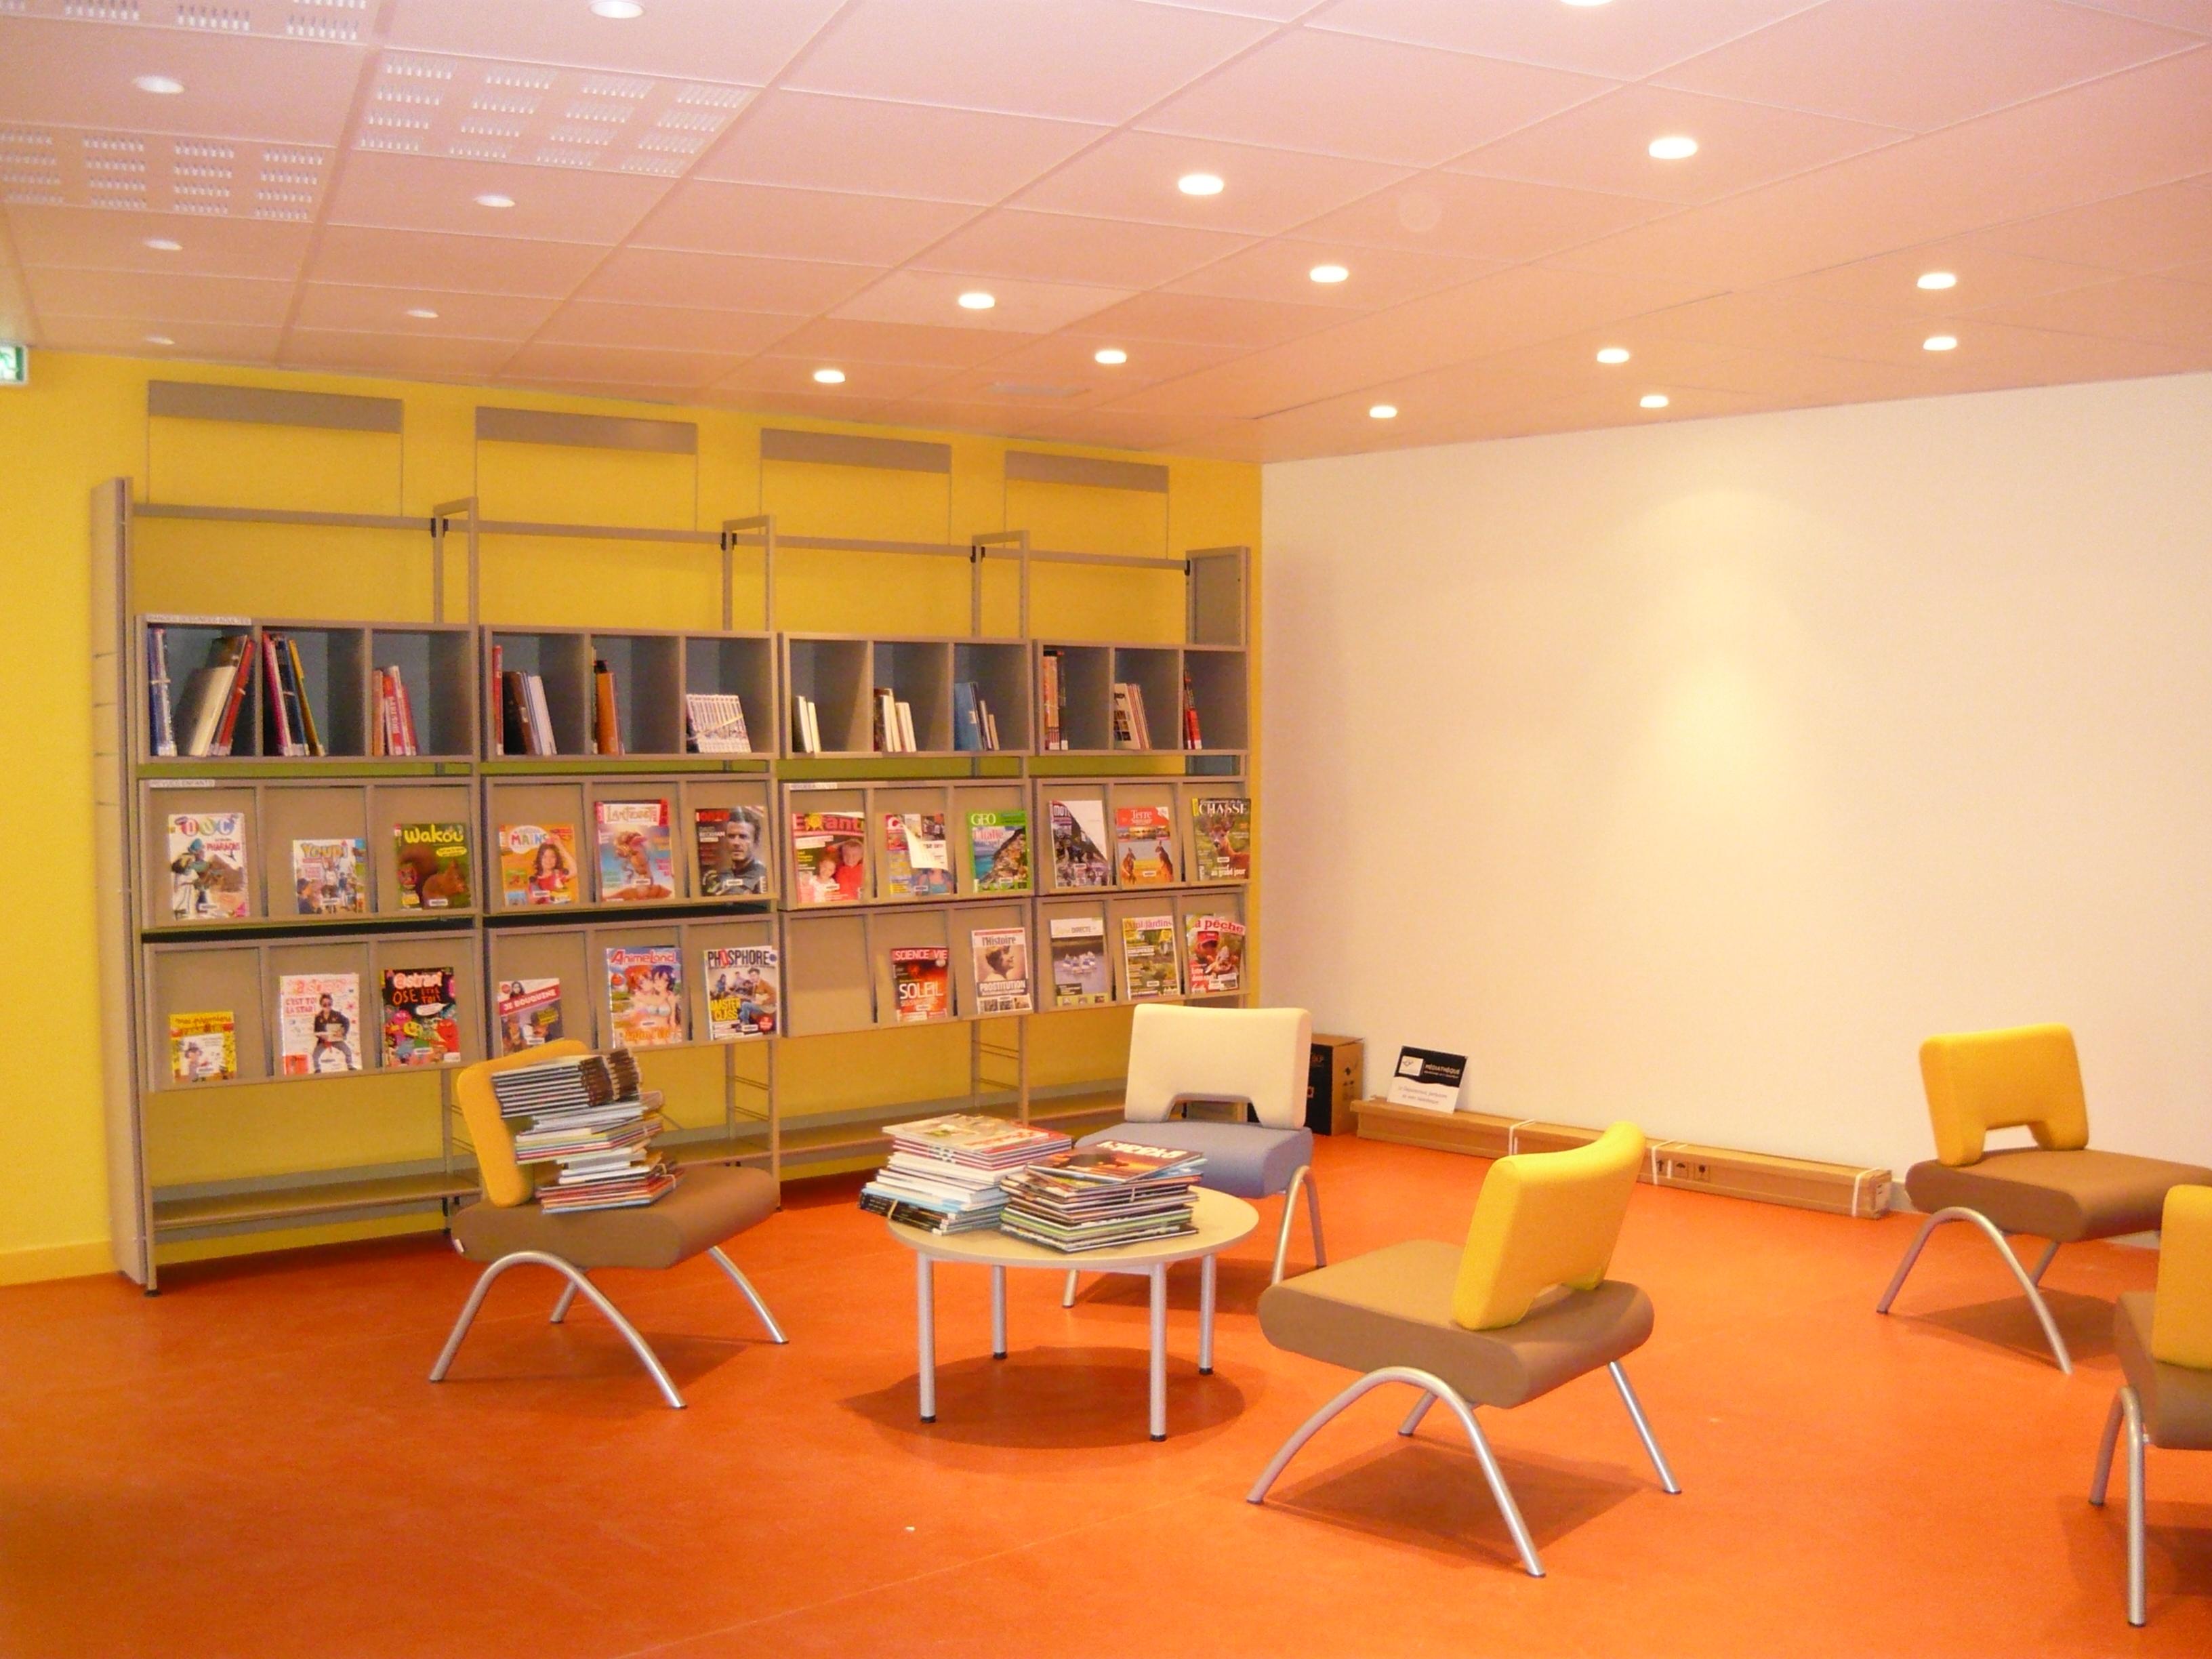 file espace presse et bd adultes jpg wikimedia commons. Black Bedroom Furniture Sets. Home Design Ideas